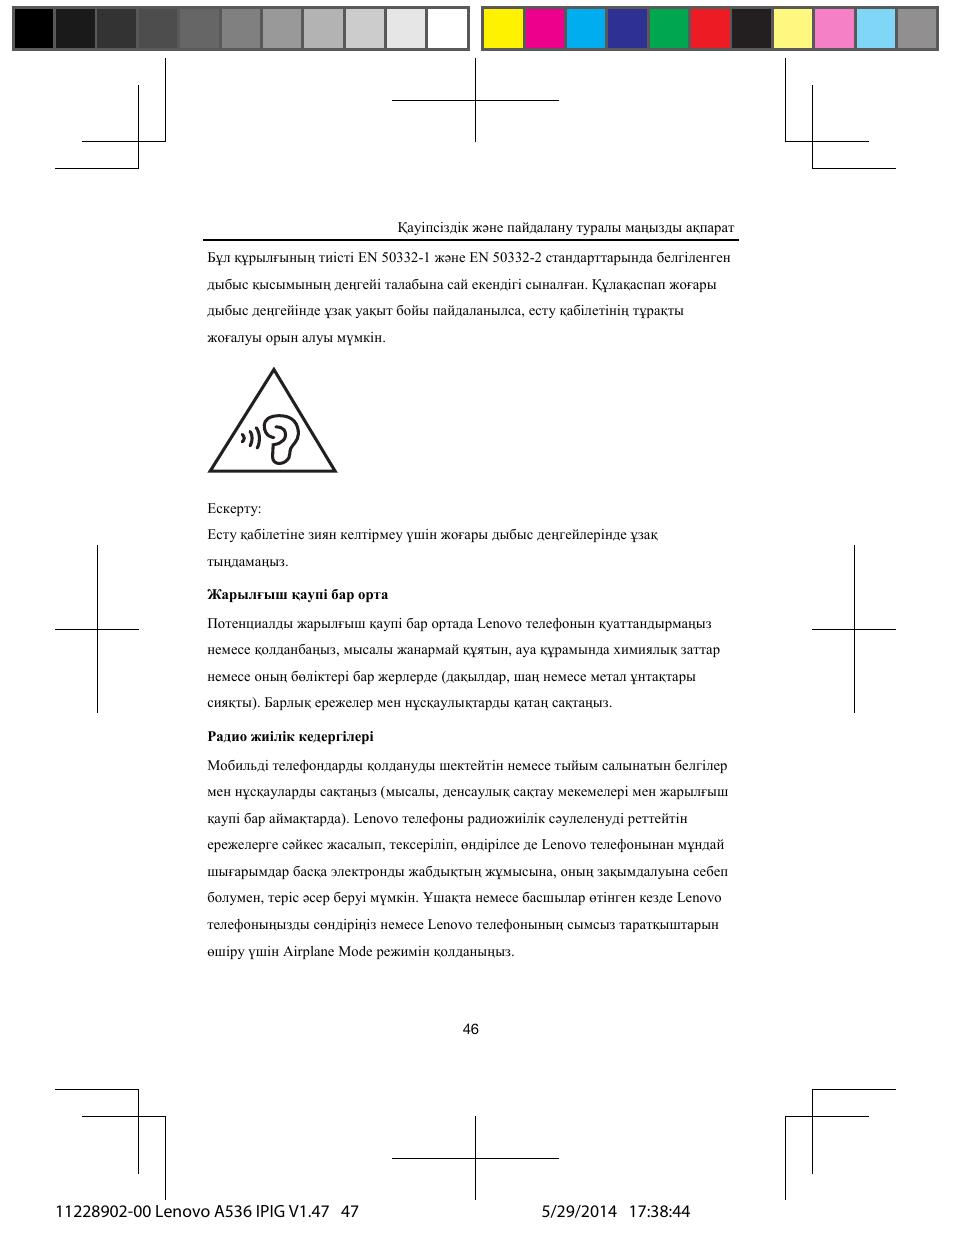 инструкция по эксплуатации леново а536